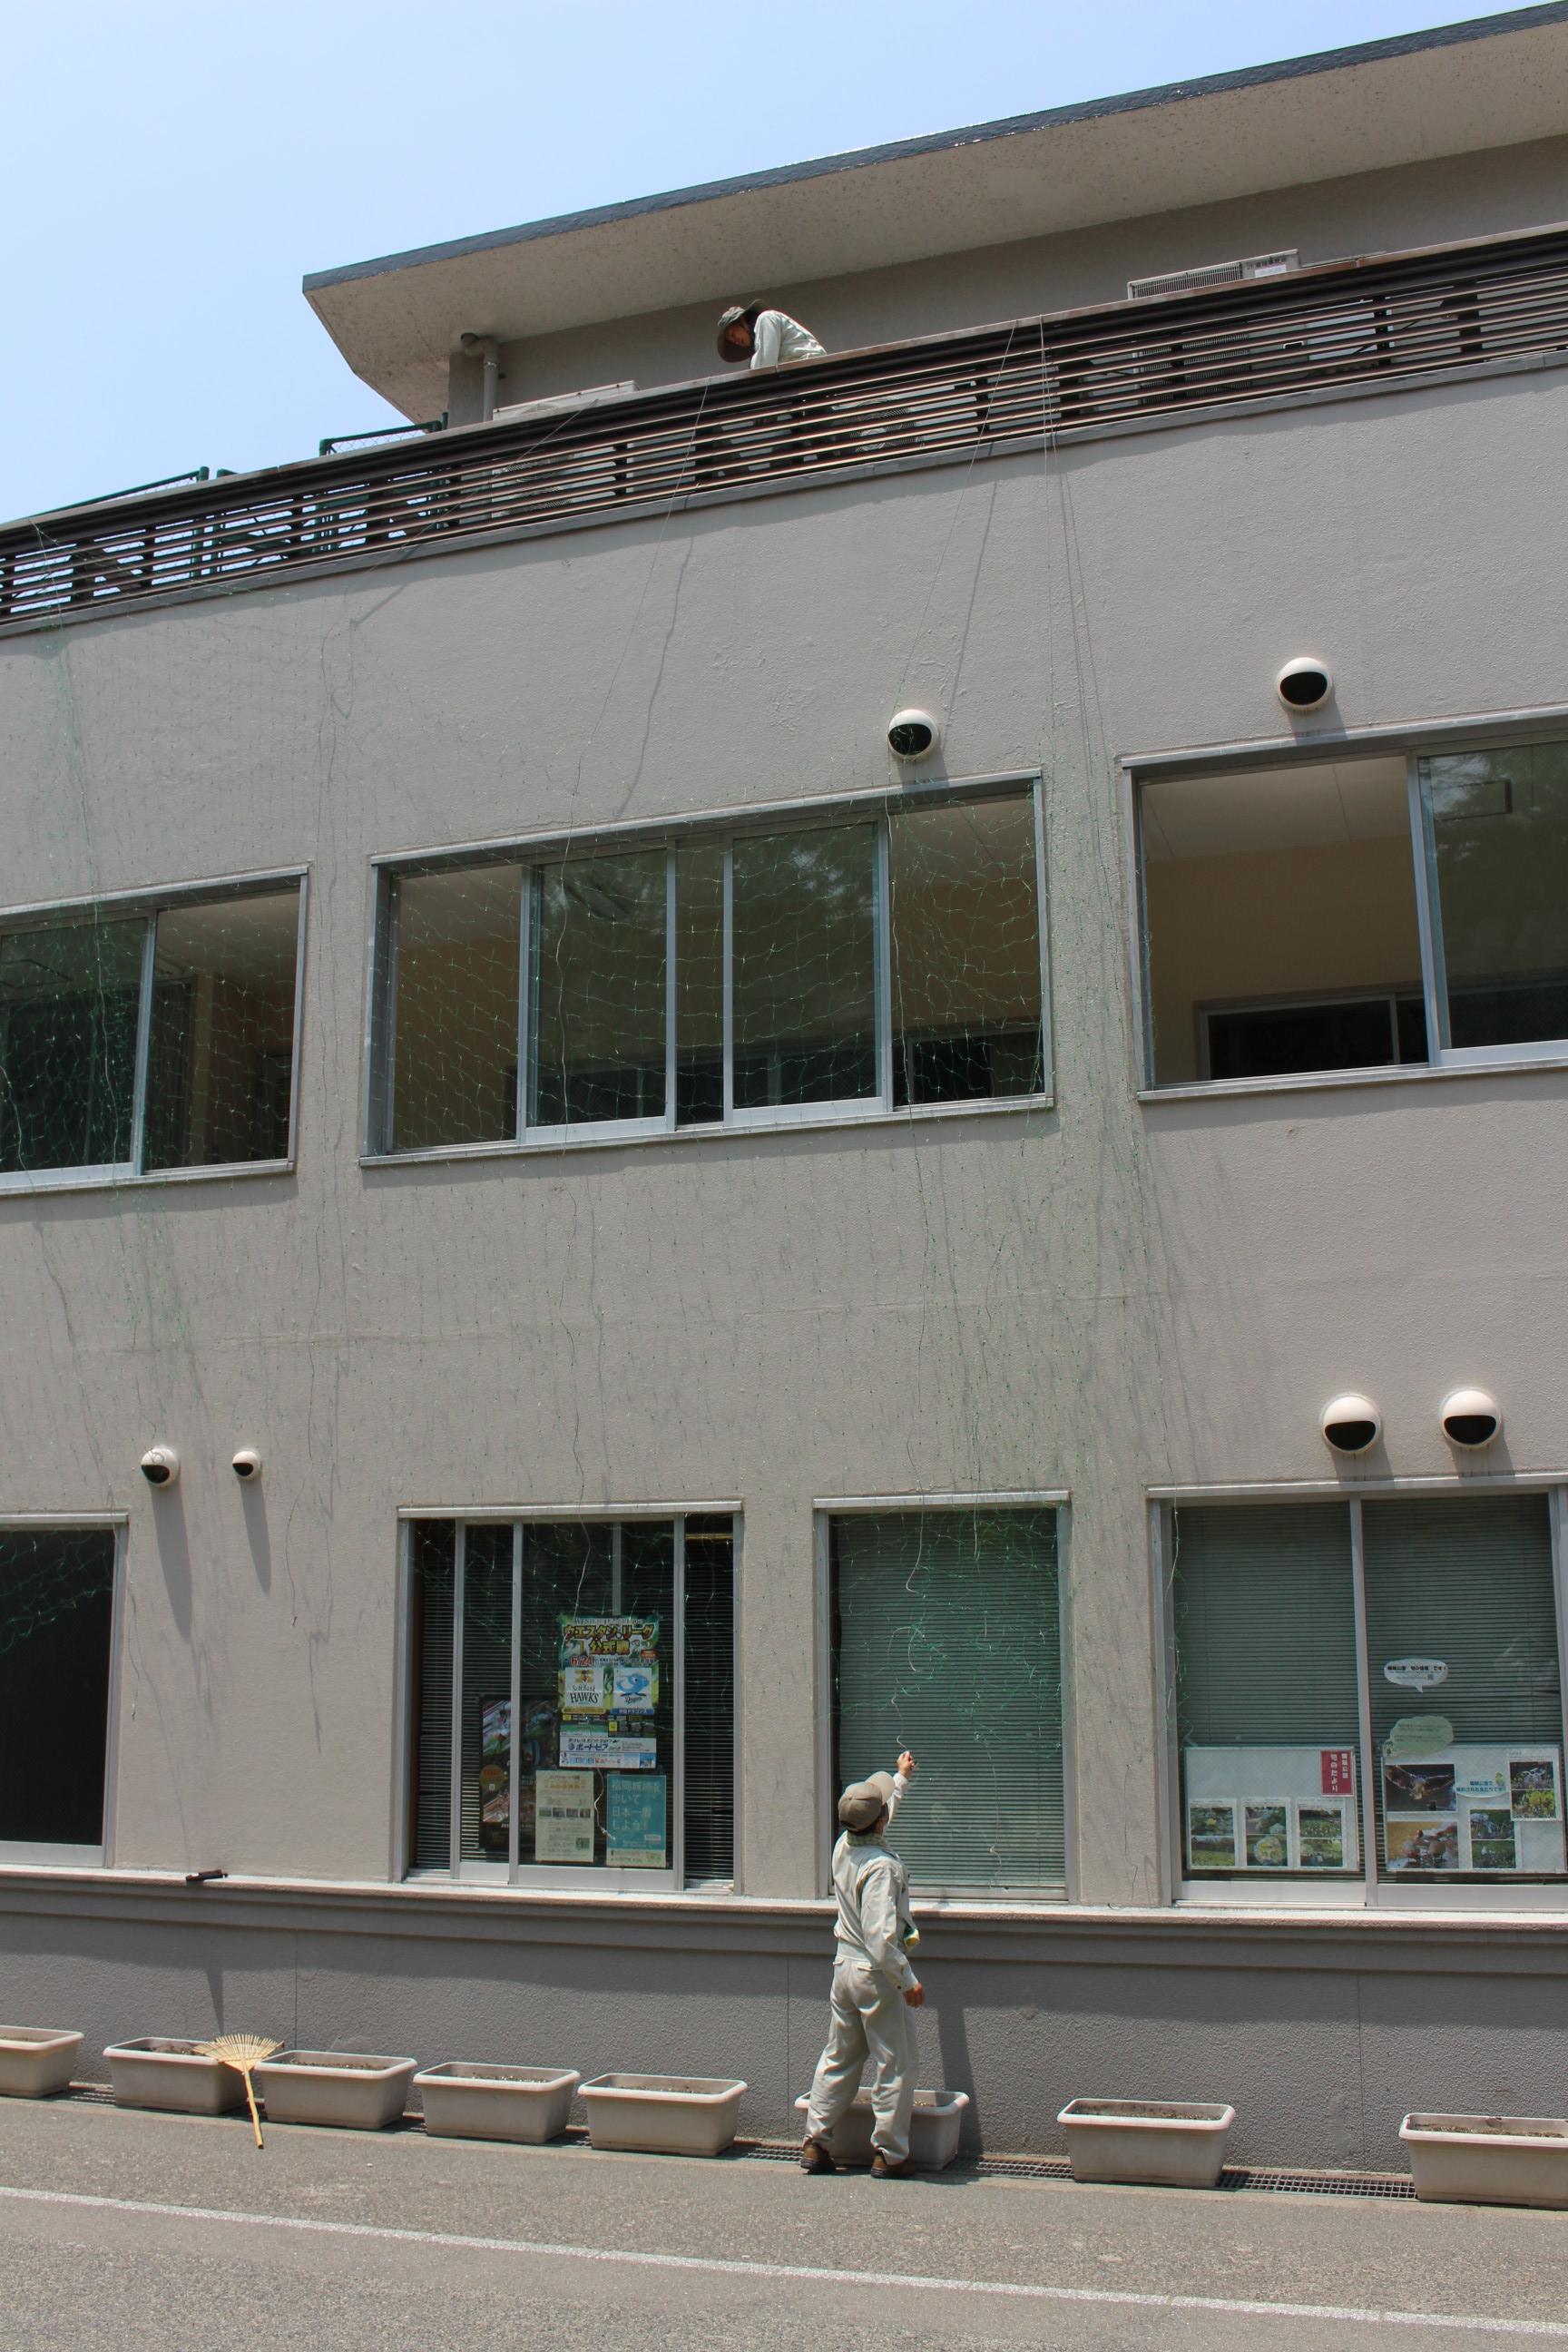 http://www.midorimachi.jp/blog/%E3%83%8D%E3%83%83%E3%83%88%E5%8F%96%E3%82%8A%E4%BB%98%E3%81%91.JPG